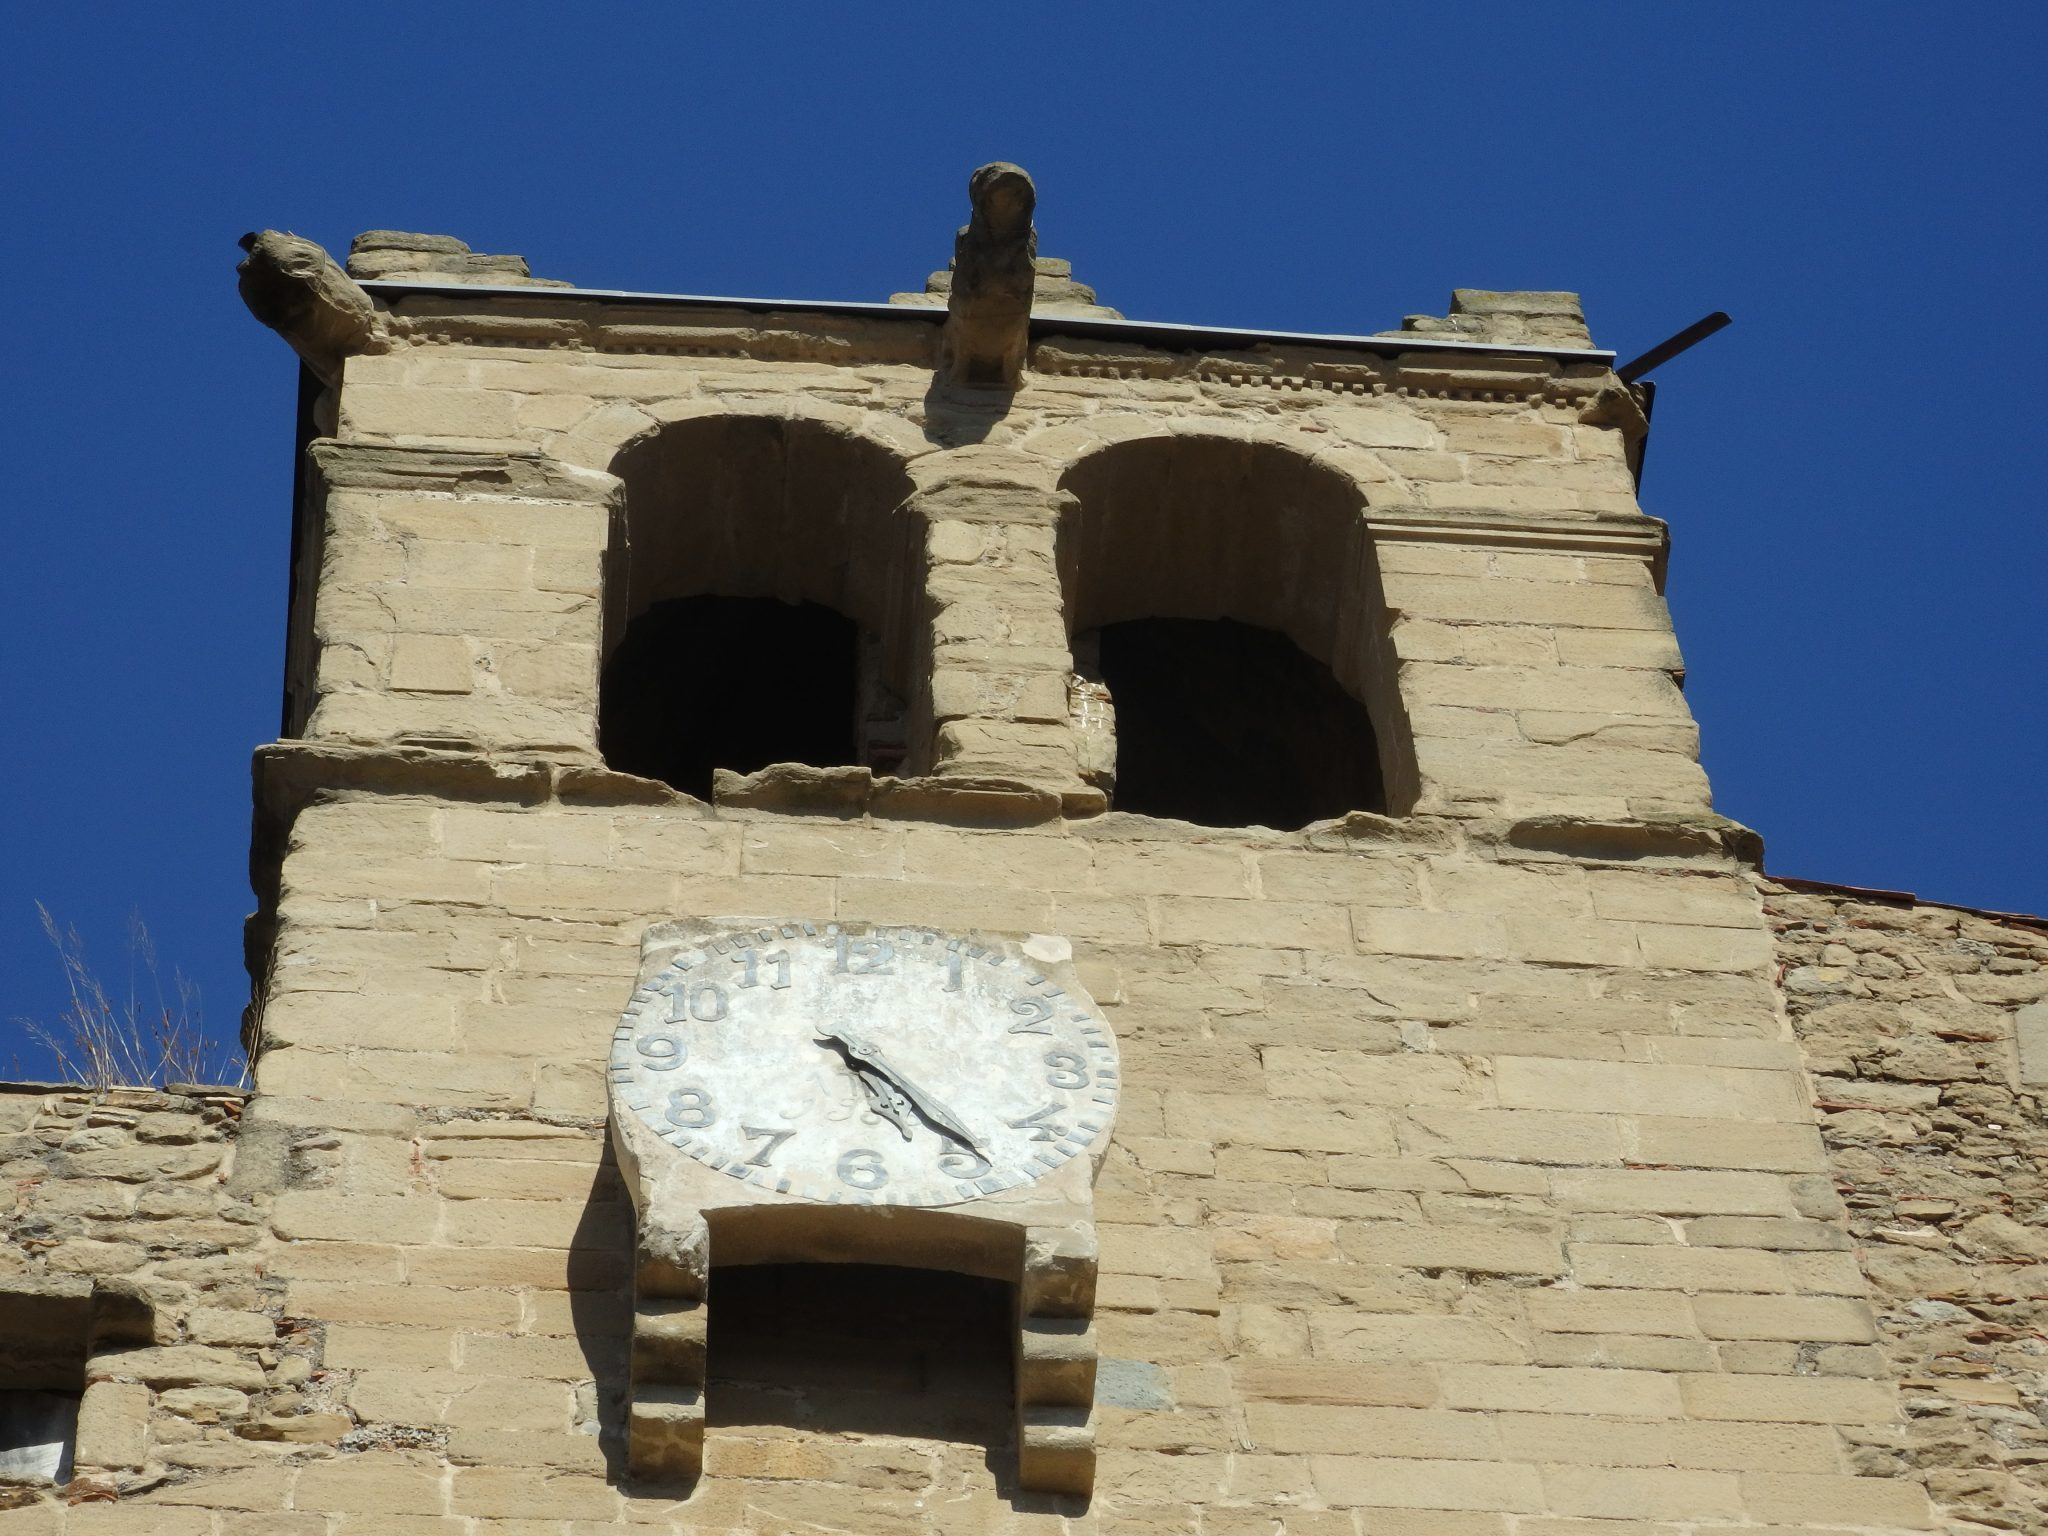 a clocktower in Madremanya, Baix Emporda, Spain